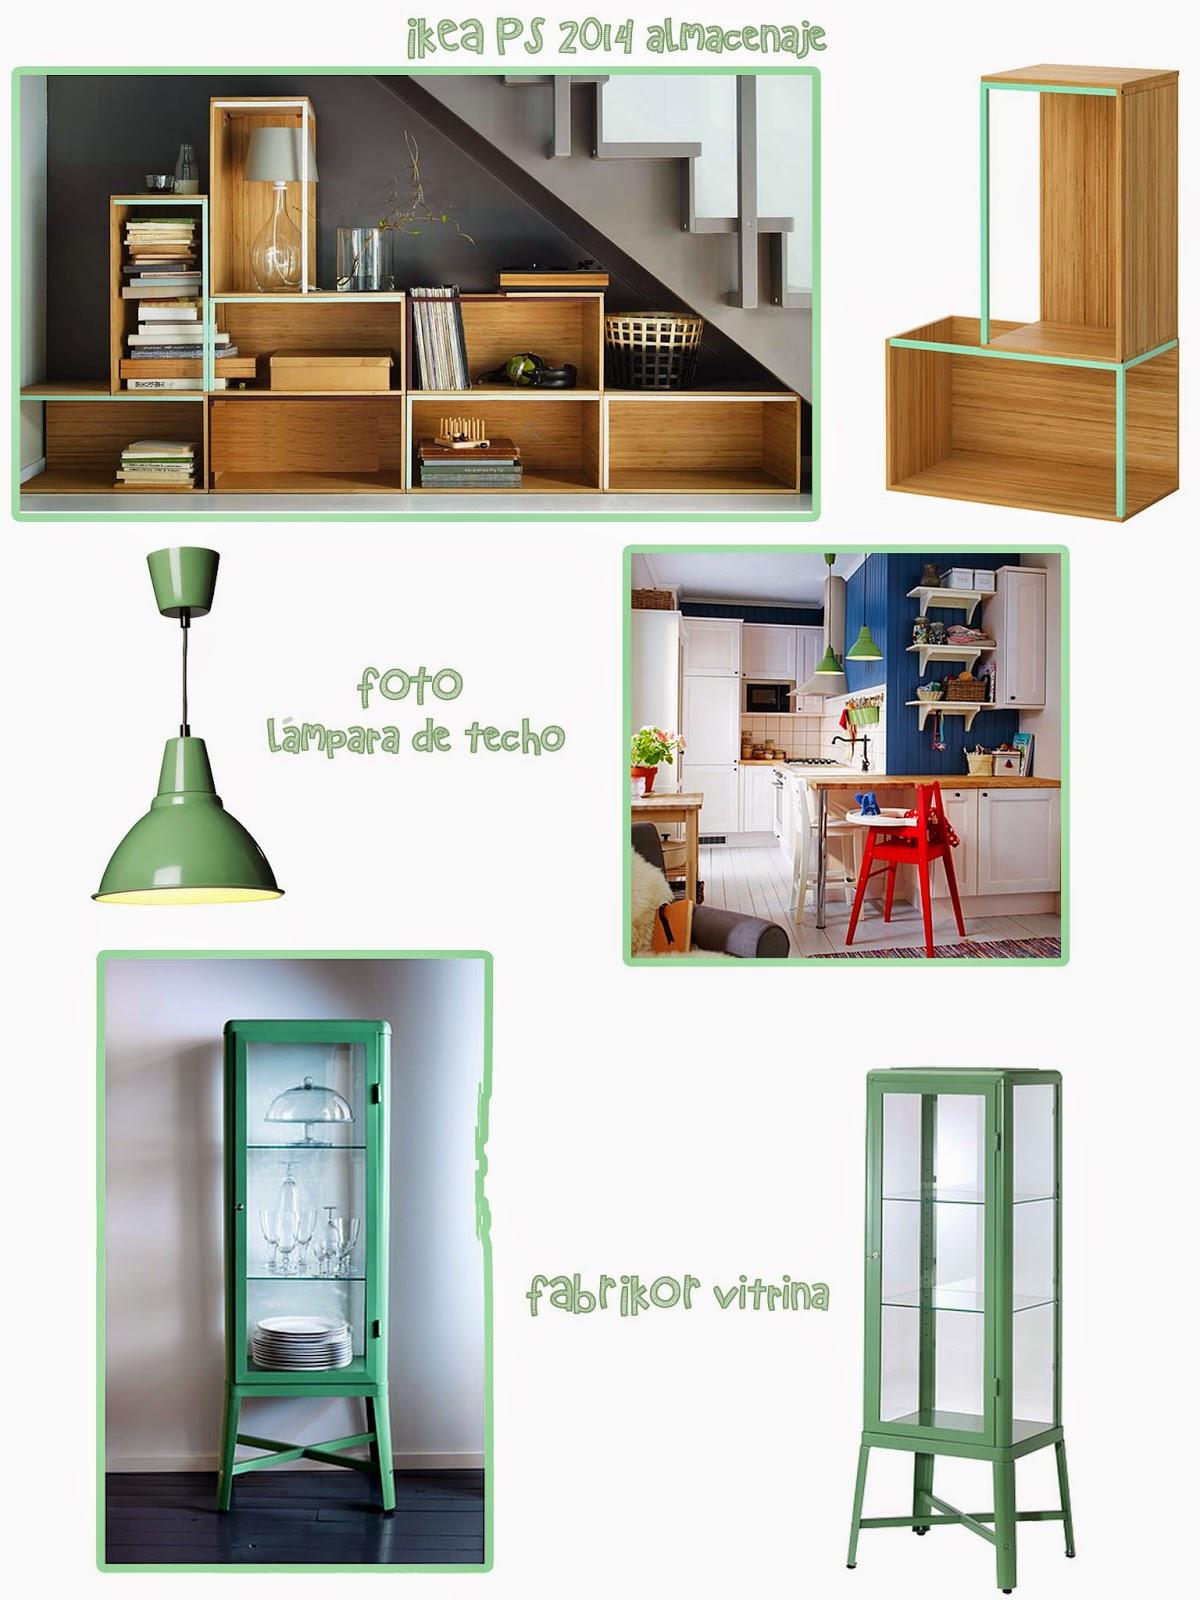 ikea-catalogo-novedades-2014-verde-mint-ikea_ps_2014-foto_lampara-fabrikor